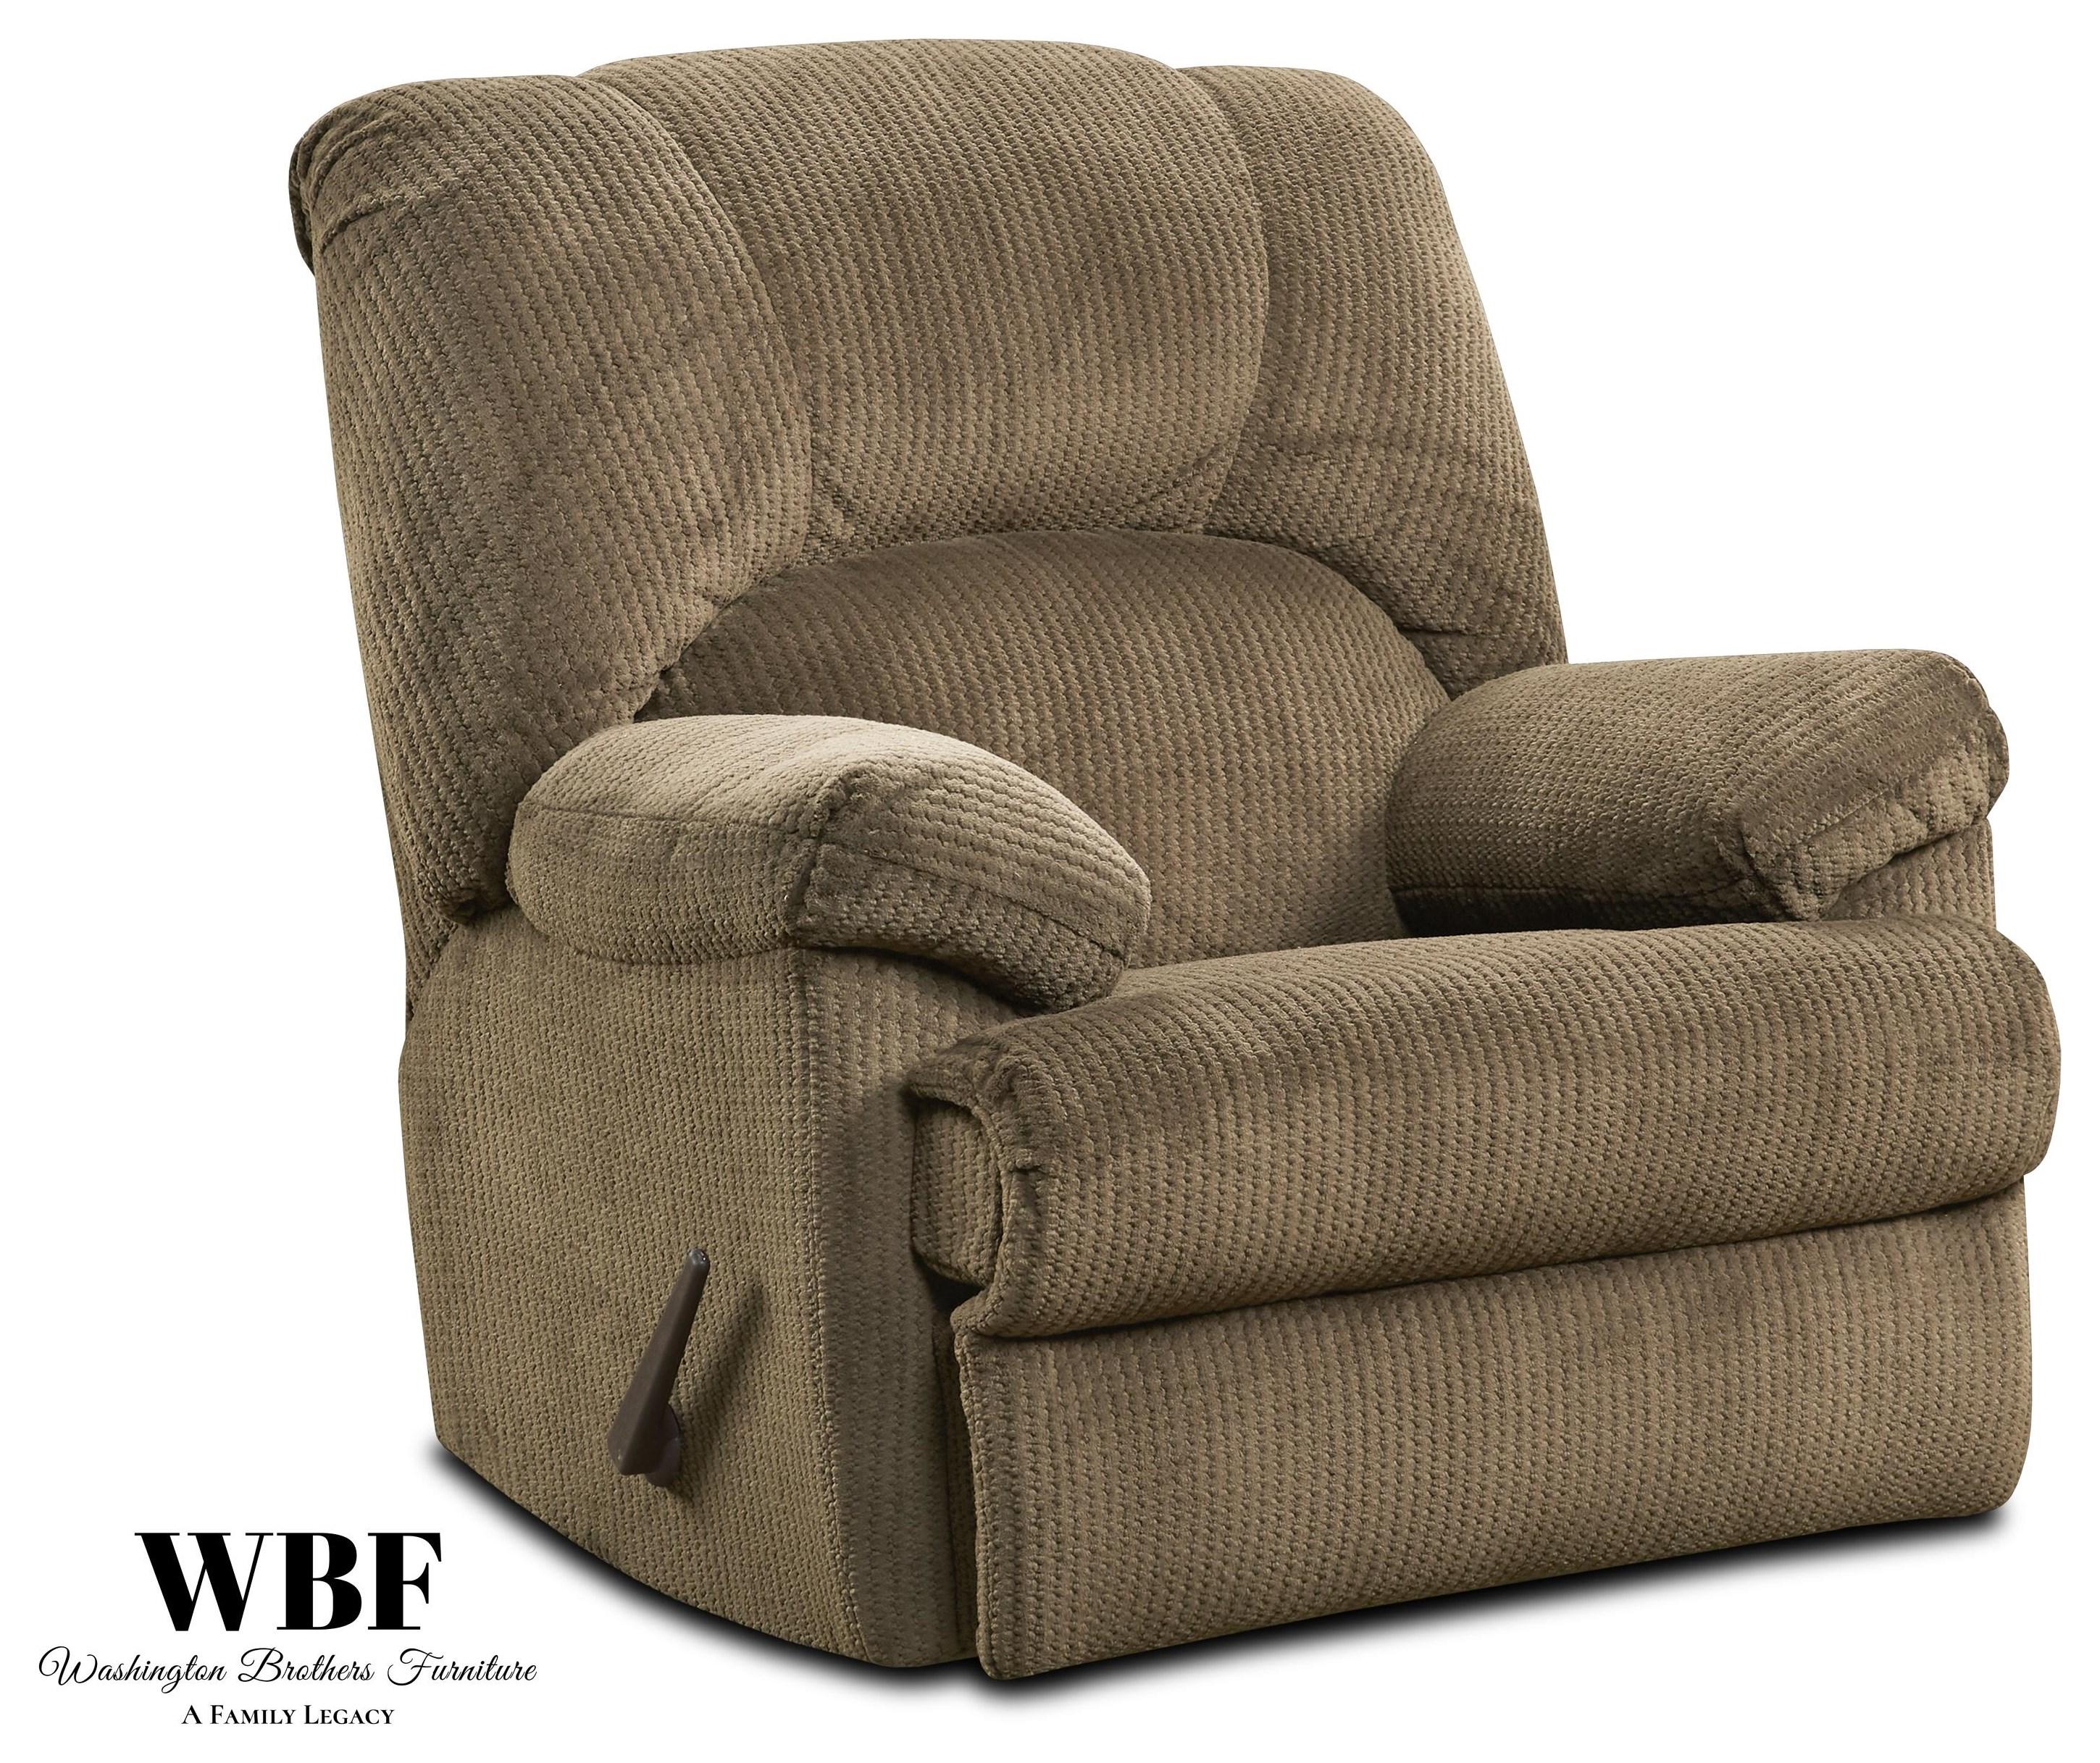 9015 Rocker Recliner - Camel by Washington Brothers Furniture at Furniture Fair - North Carolina